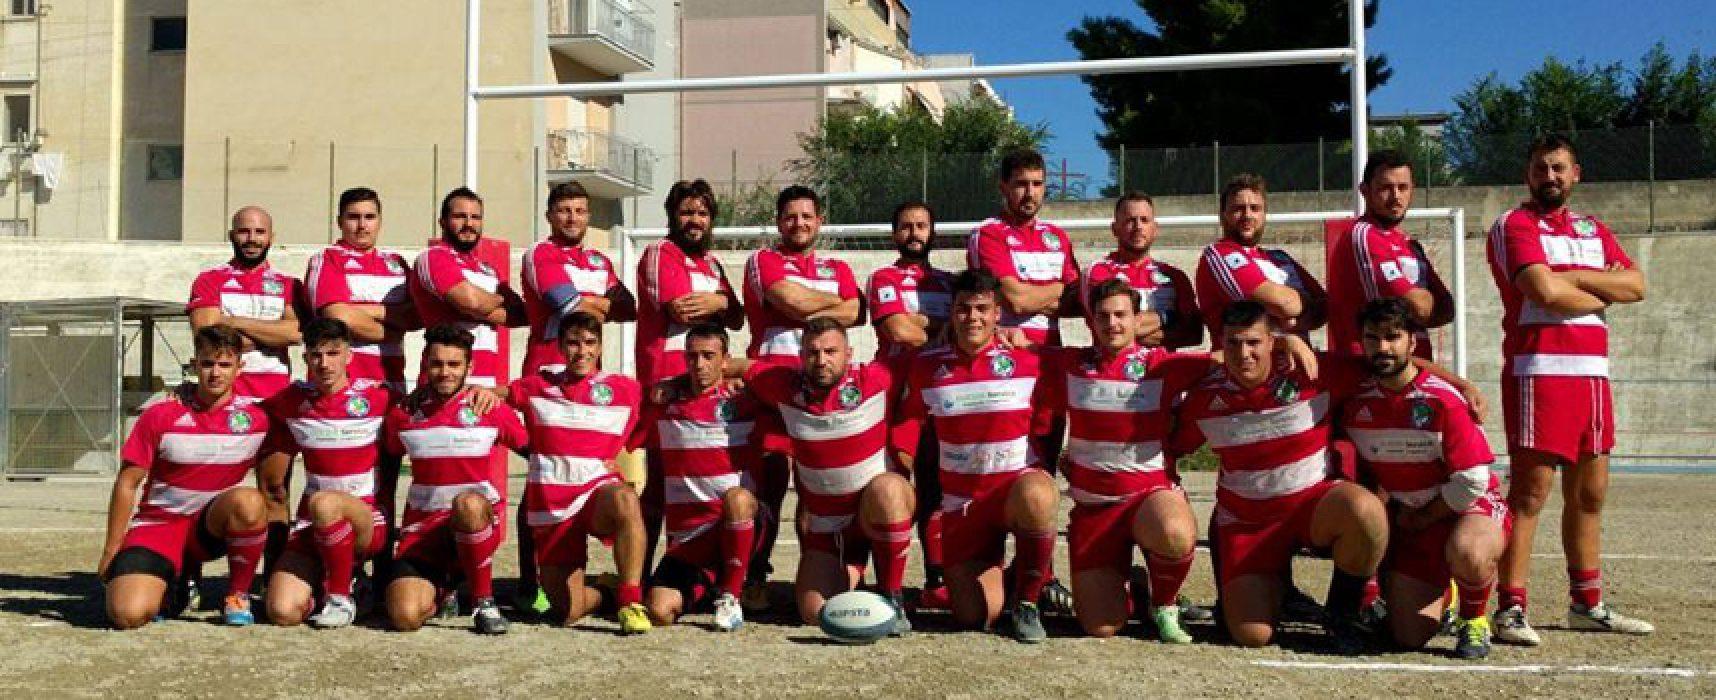 Rugby, pesante sconfitta per i Draghi Bat in casa del Potenza capolista / CLASSIFICA